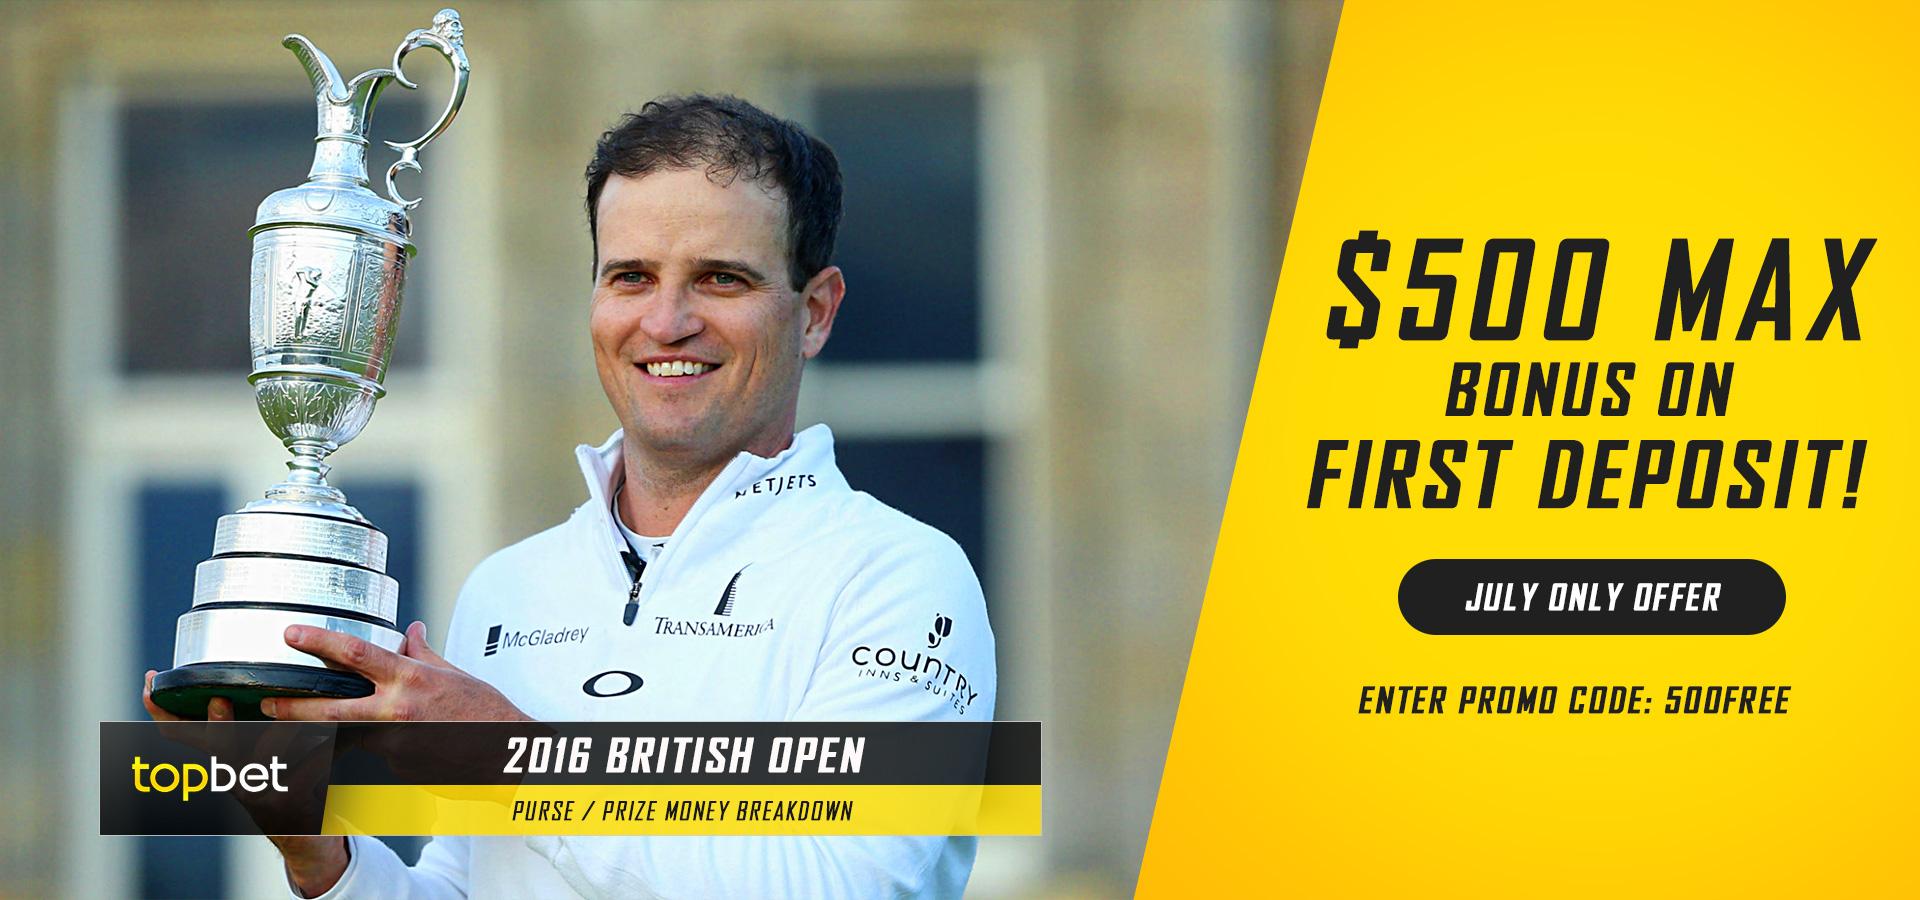 2016 british open prize money winners